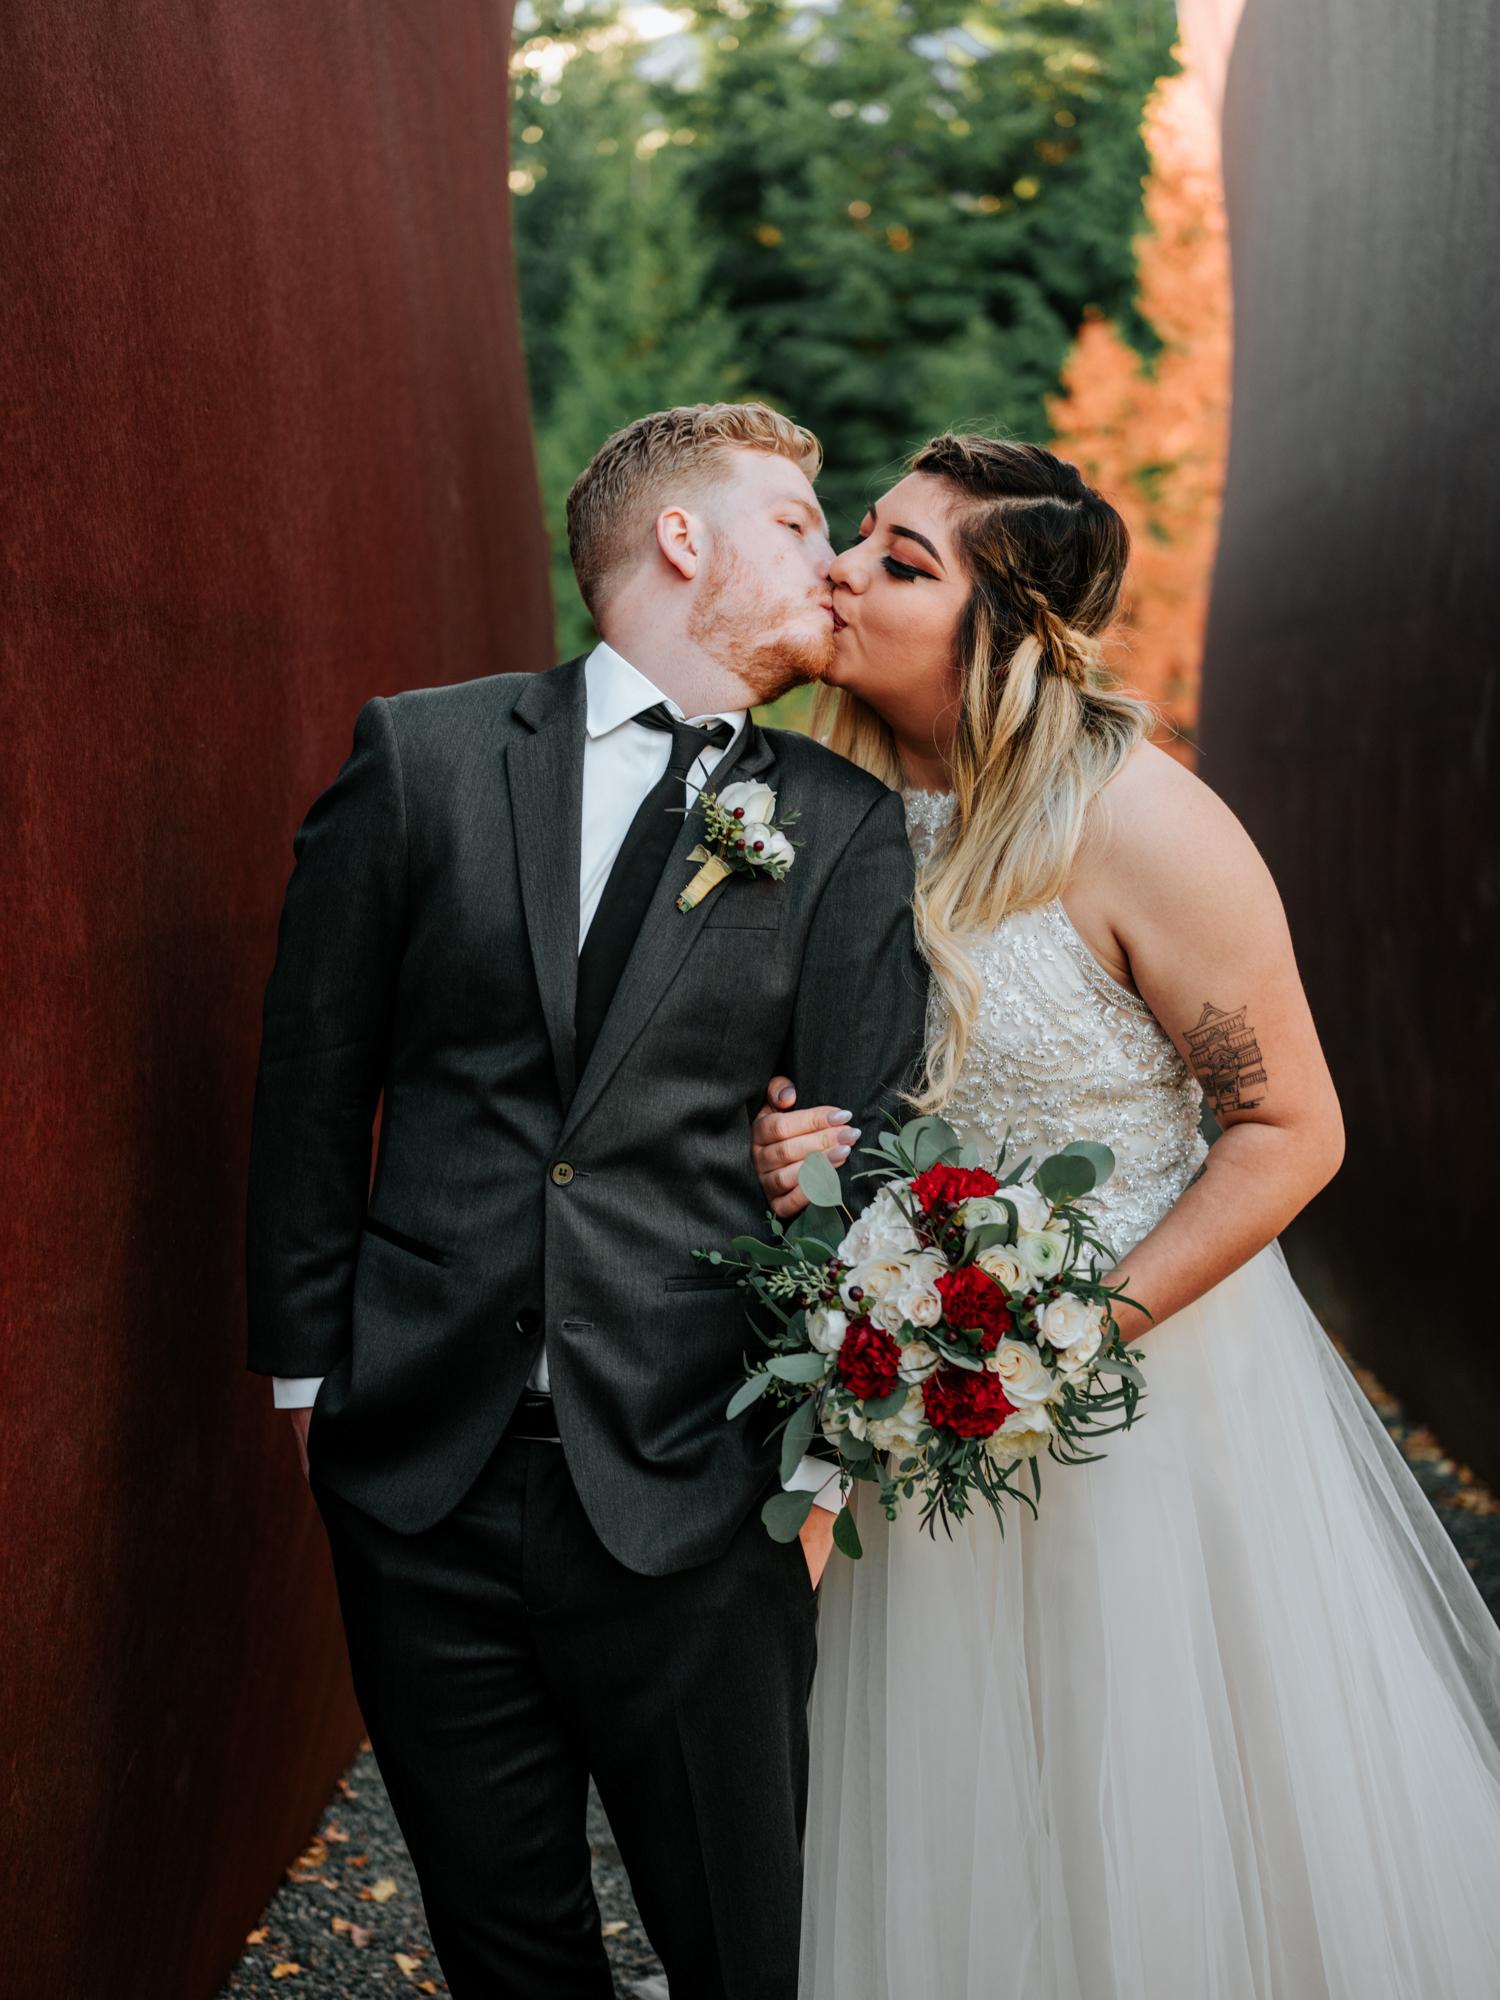 Stolen Glimpses Seattle Wedding Photographers 31.jpg